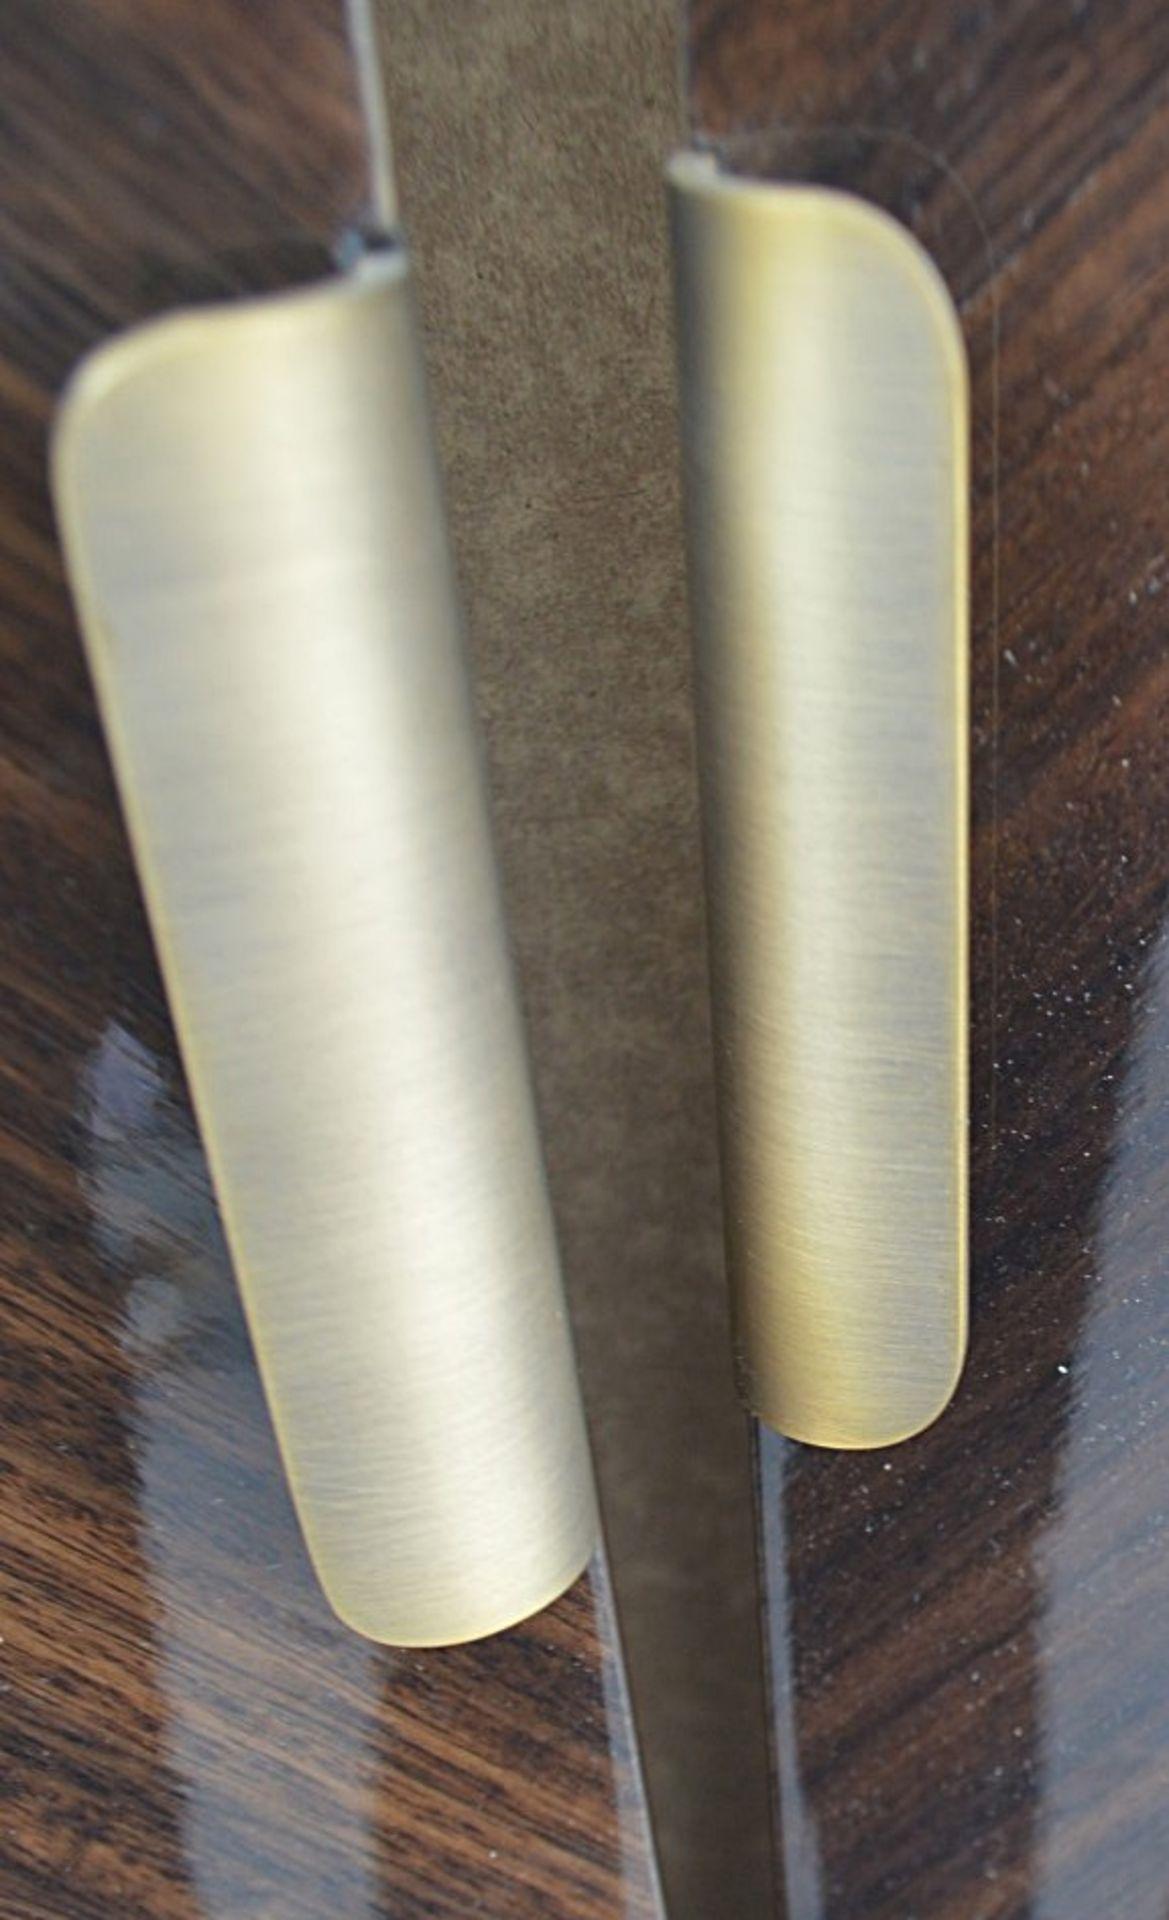 1 x FRATO Bespoke 'Siena' Wardrobe With A High Gloss Brown Wood Veneer Finish - Original RRP £18,890 - Image 13 of 21